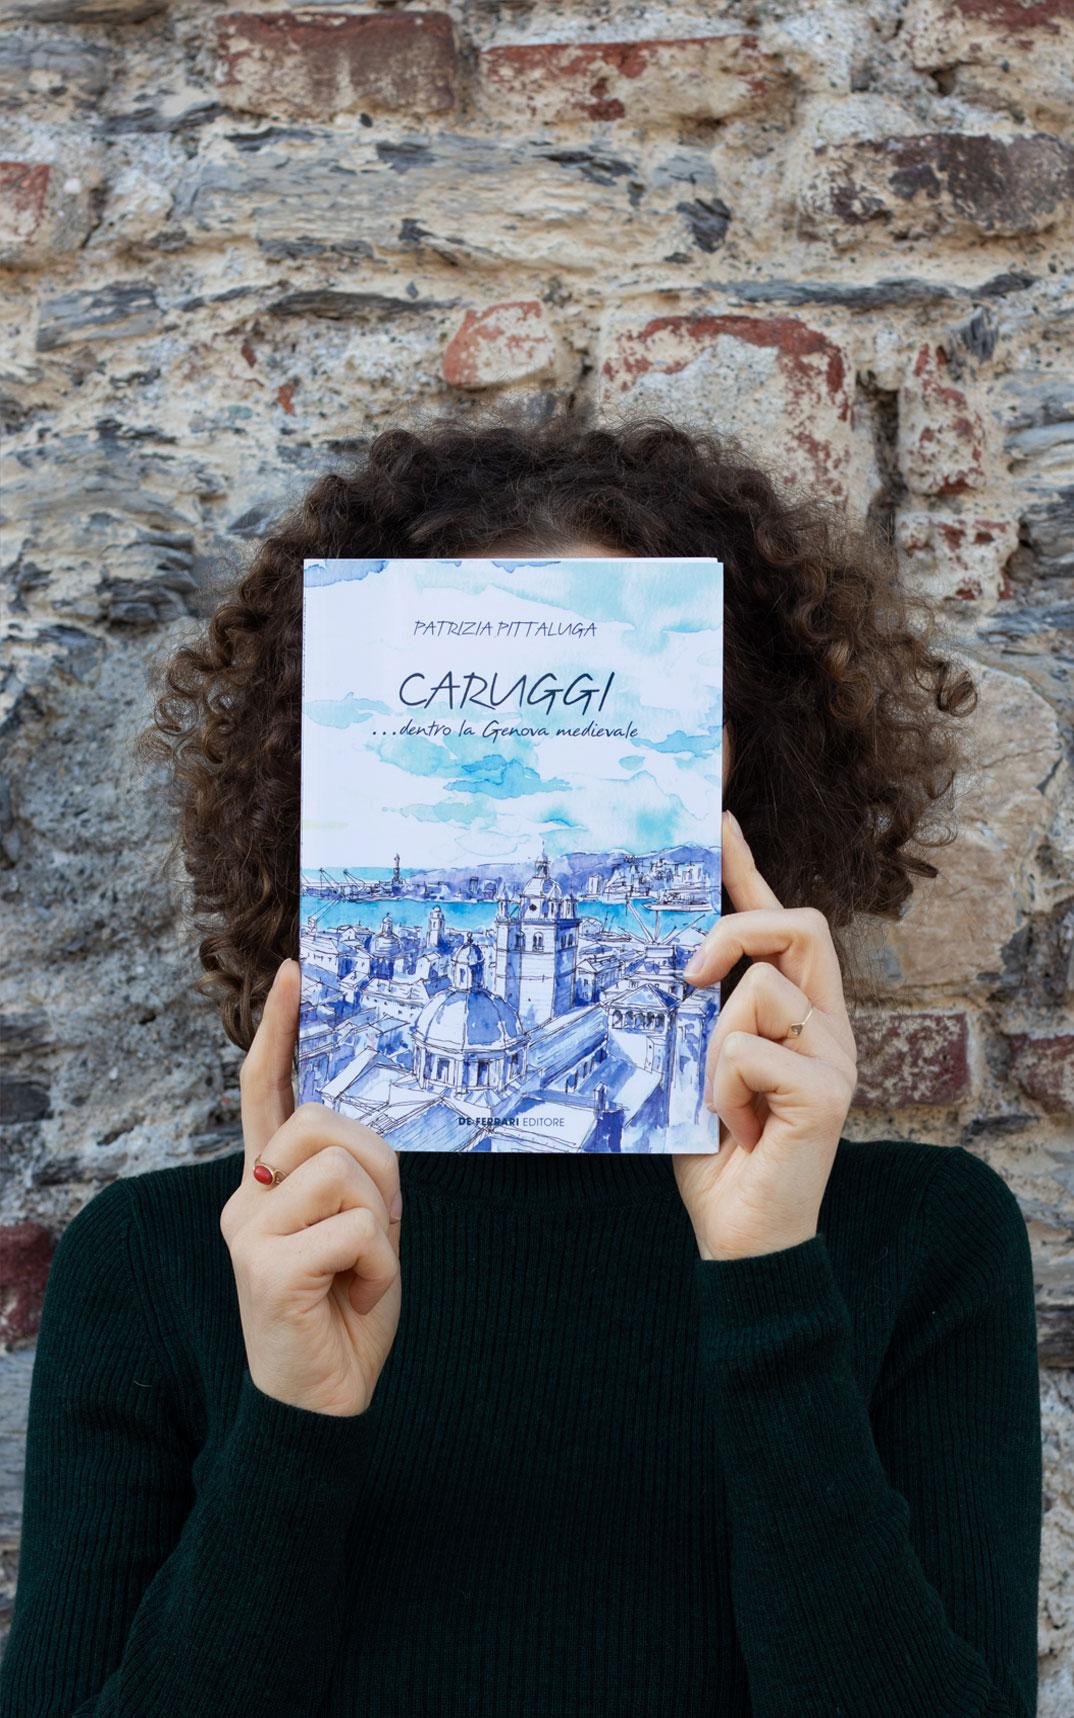 CARUGGI…dentro la Genova medievale